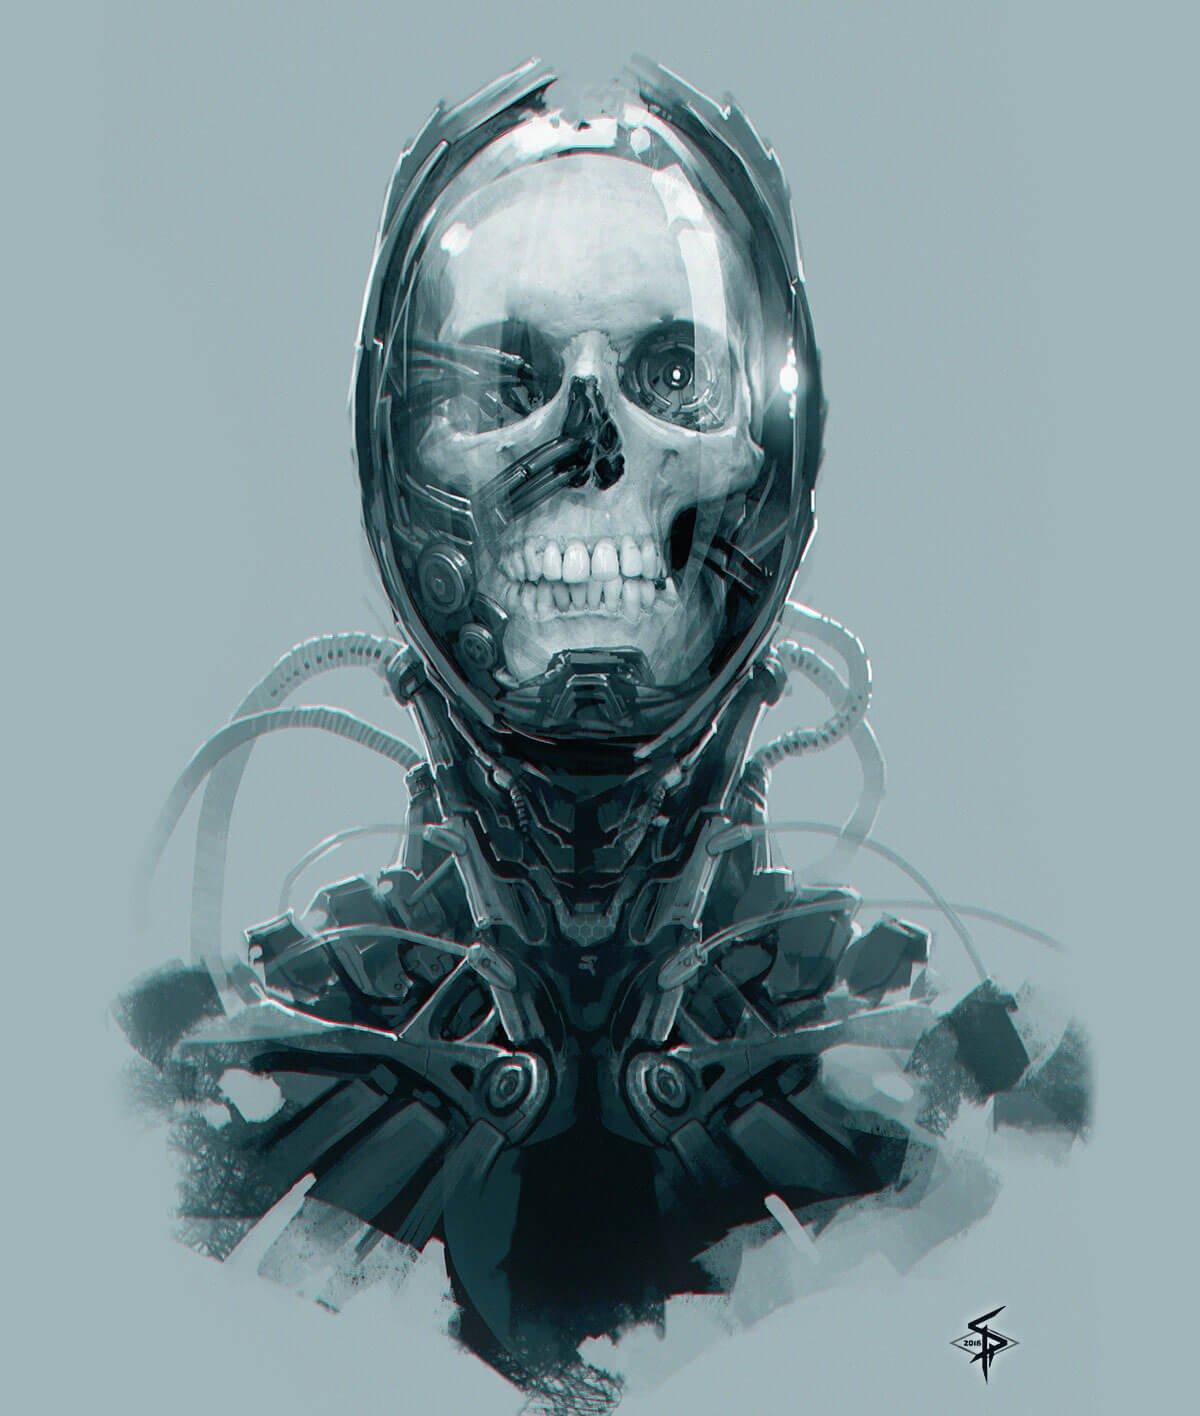 Skull Character by Aleksandr Plihta